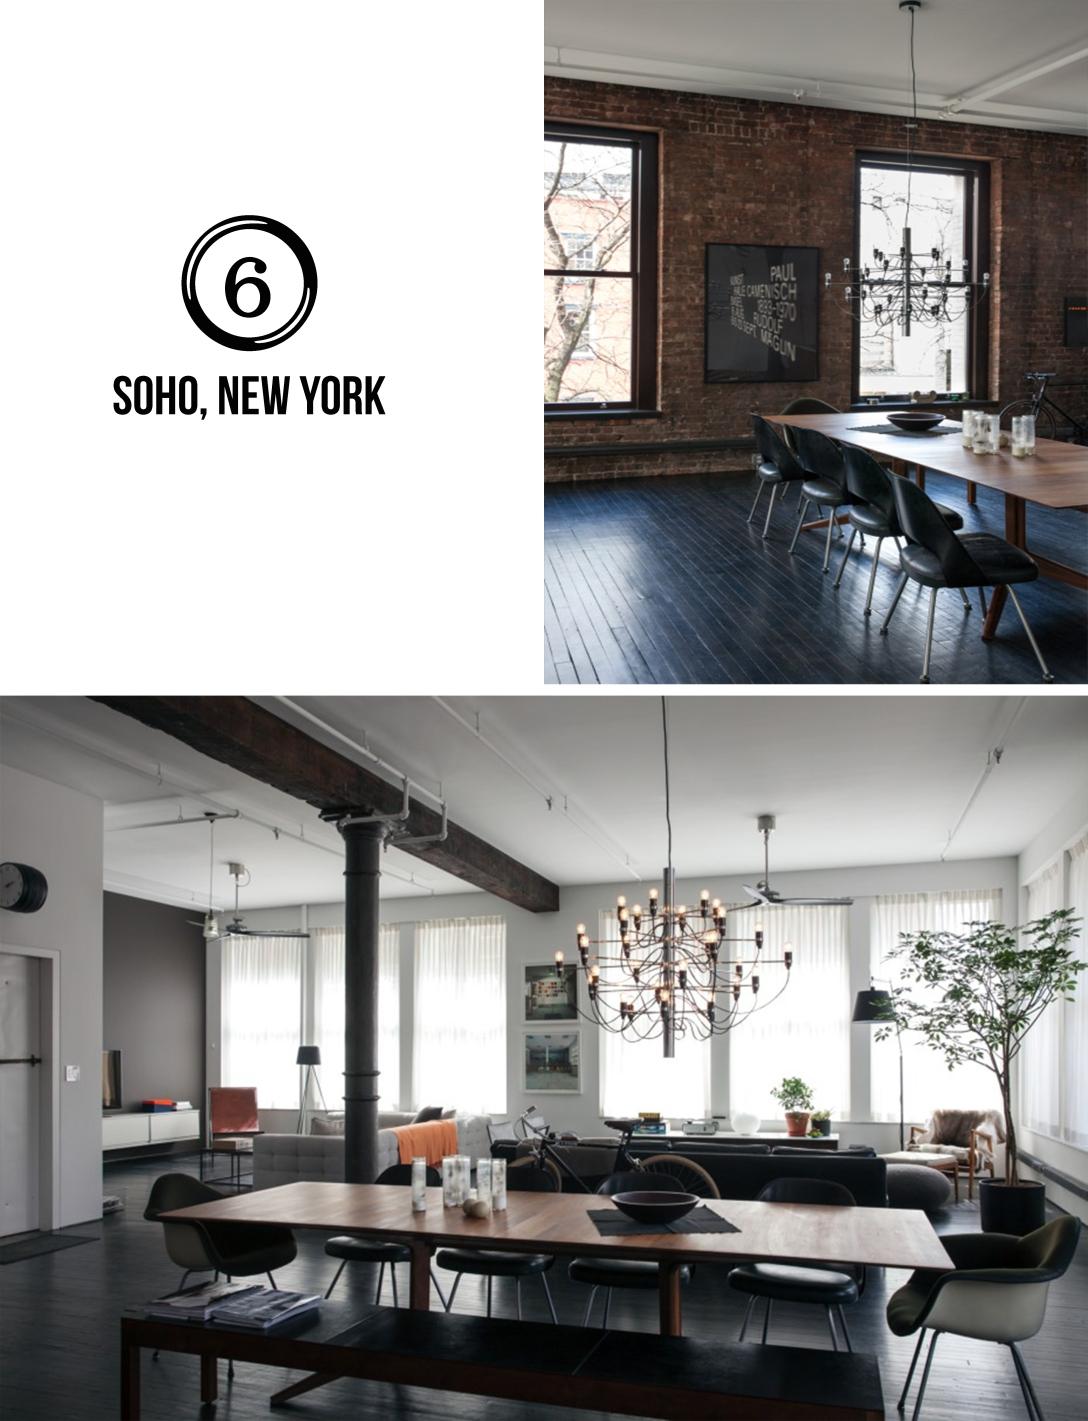 soho, new york2